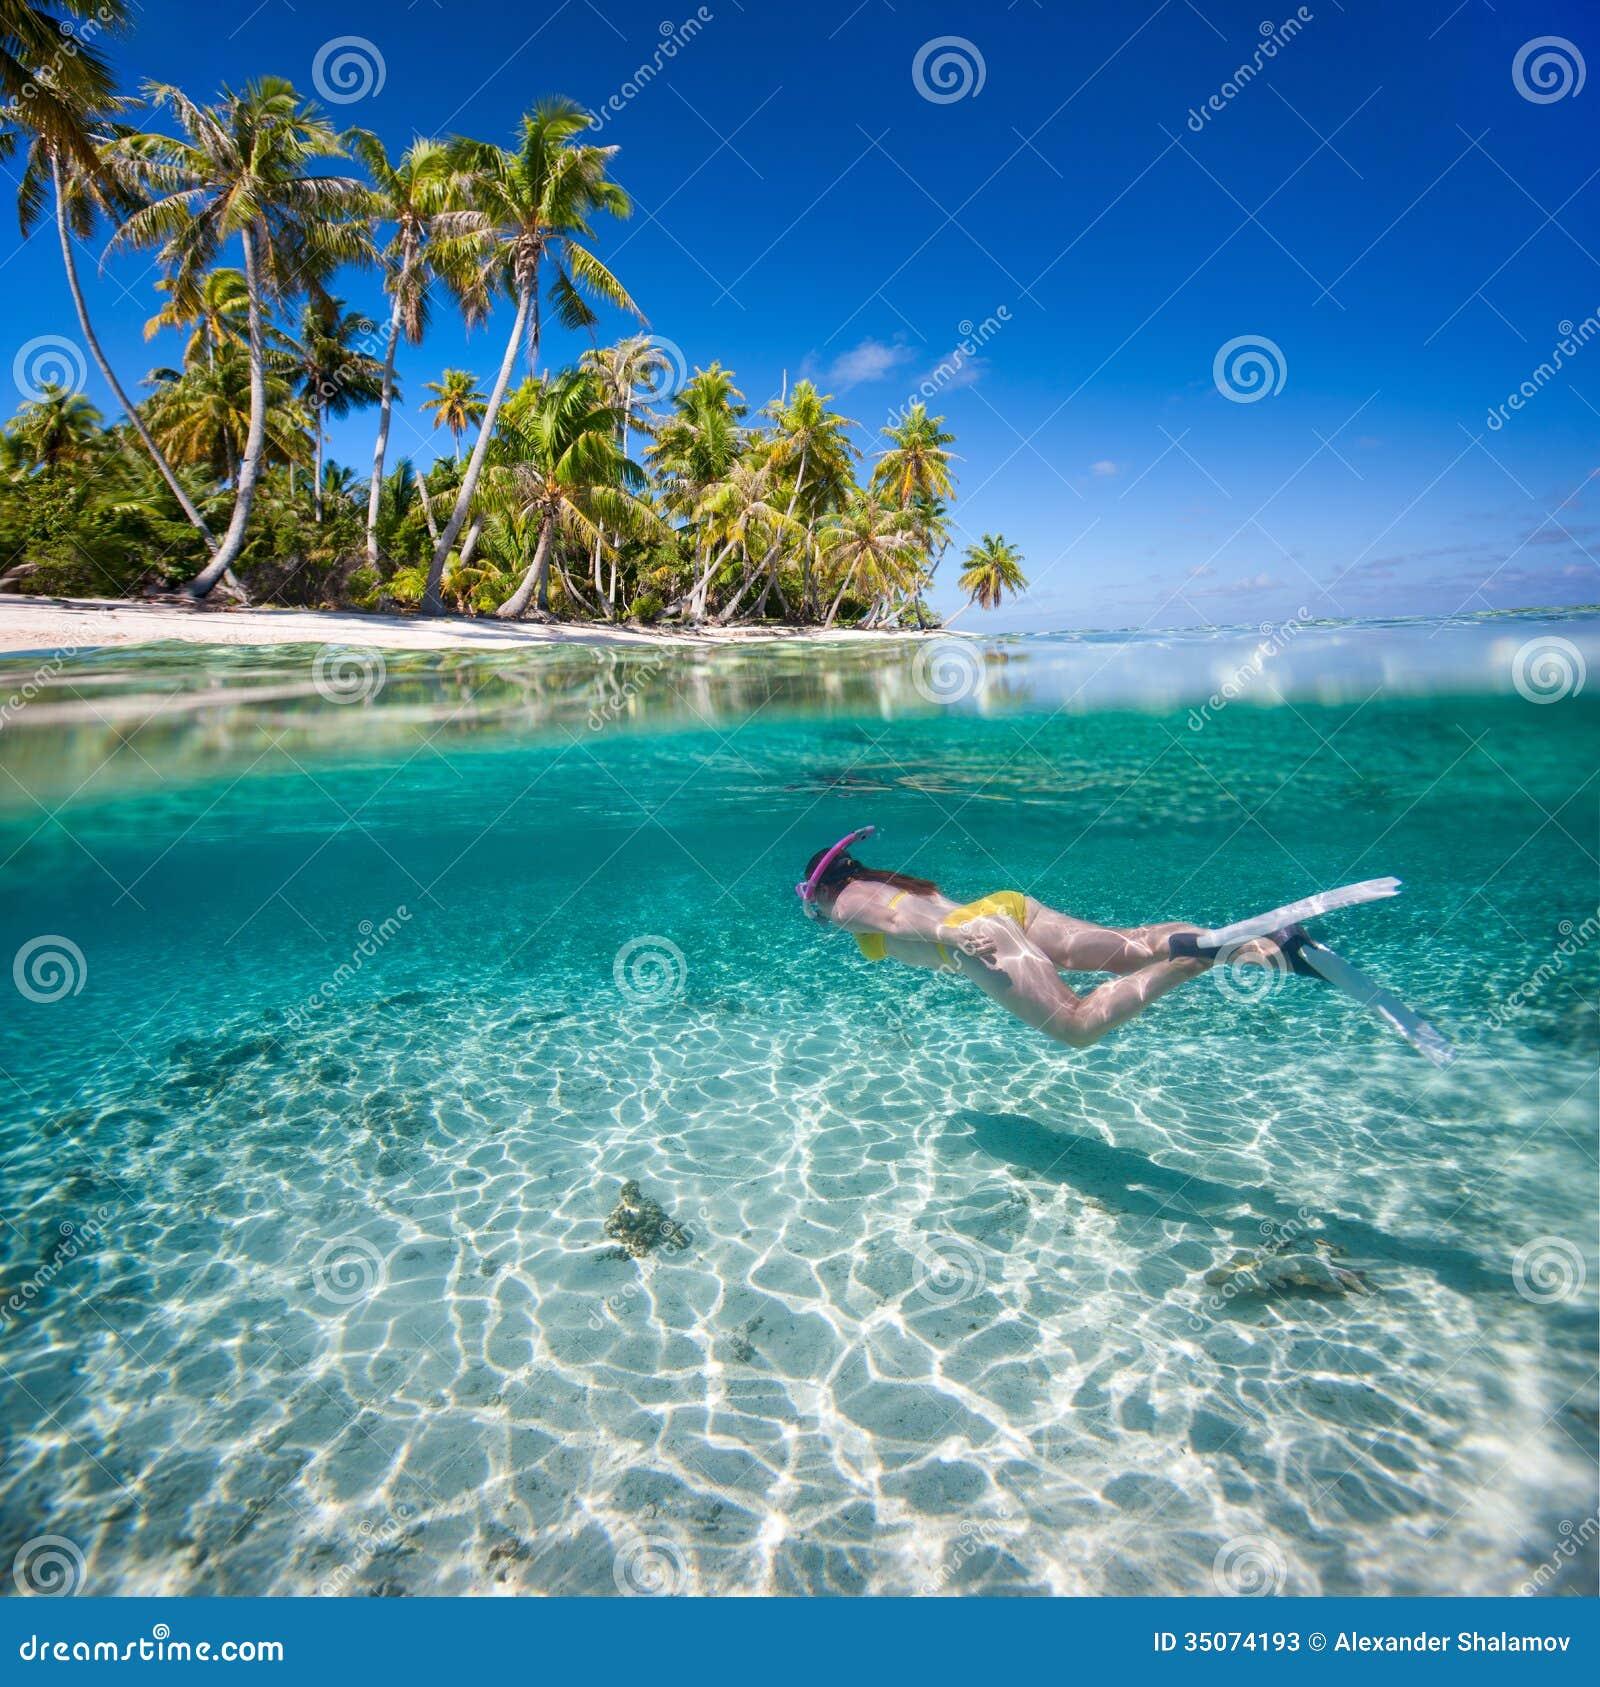 femme nageant sous l 39 eau image stock image du plage 35074193. Black Bedroom Furniture Sets. Home Design Ideas